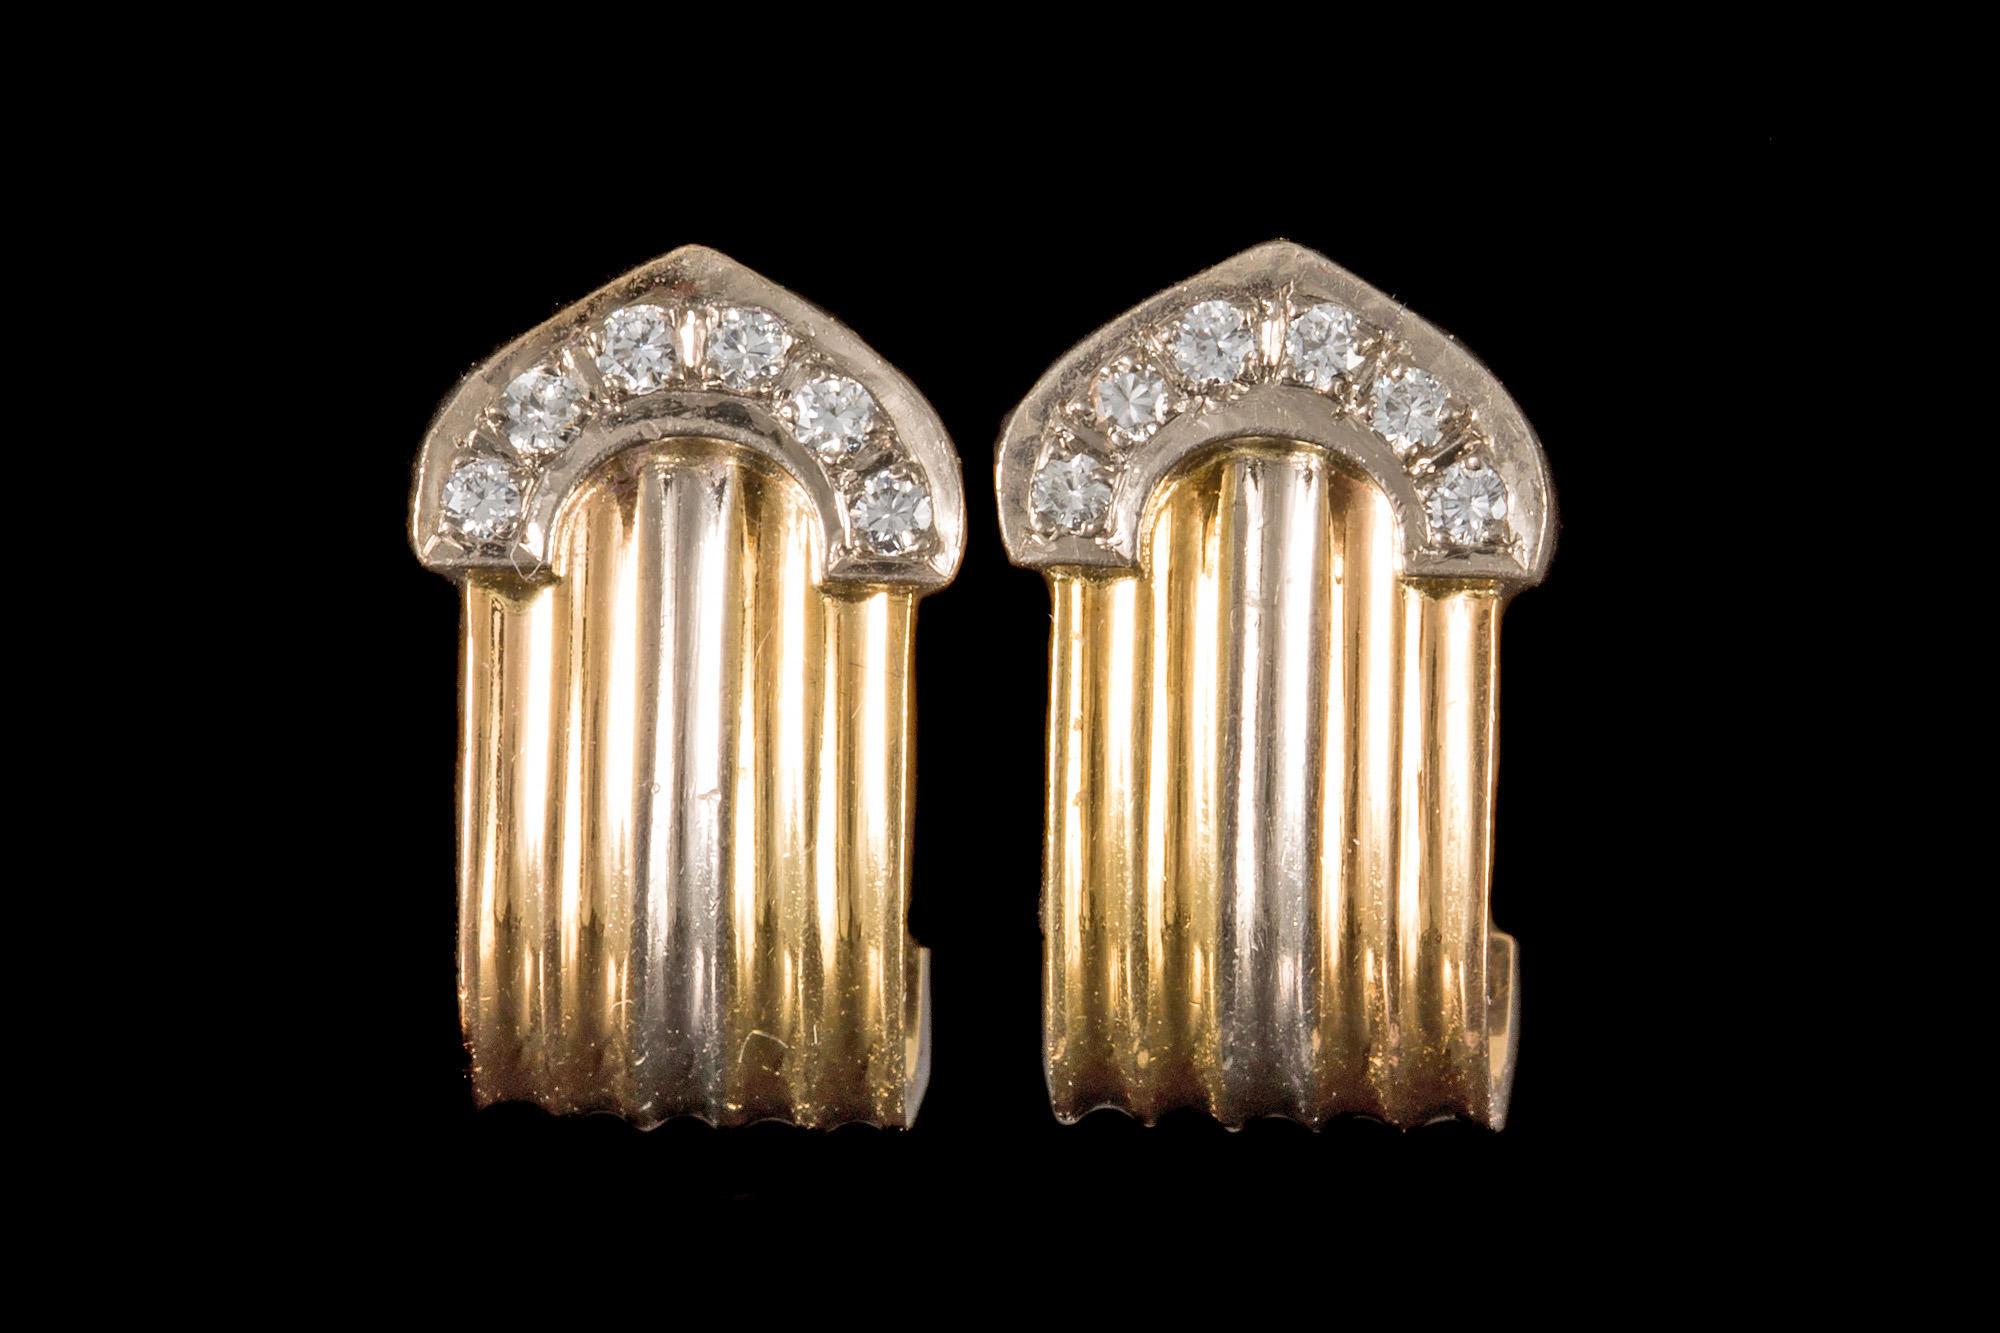 Lot 27 - A PAIR OF DIAMOND SET EARRINGS, the flut